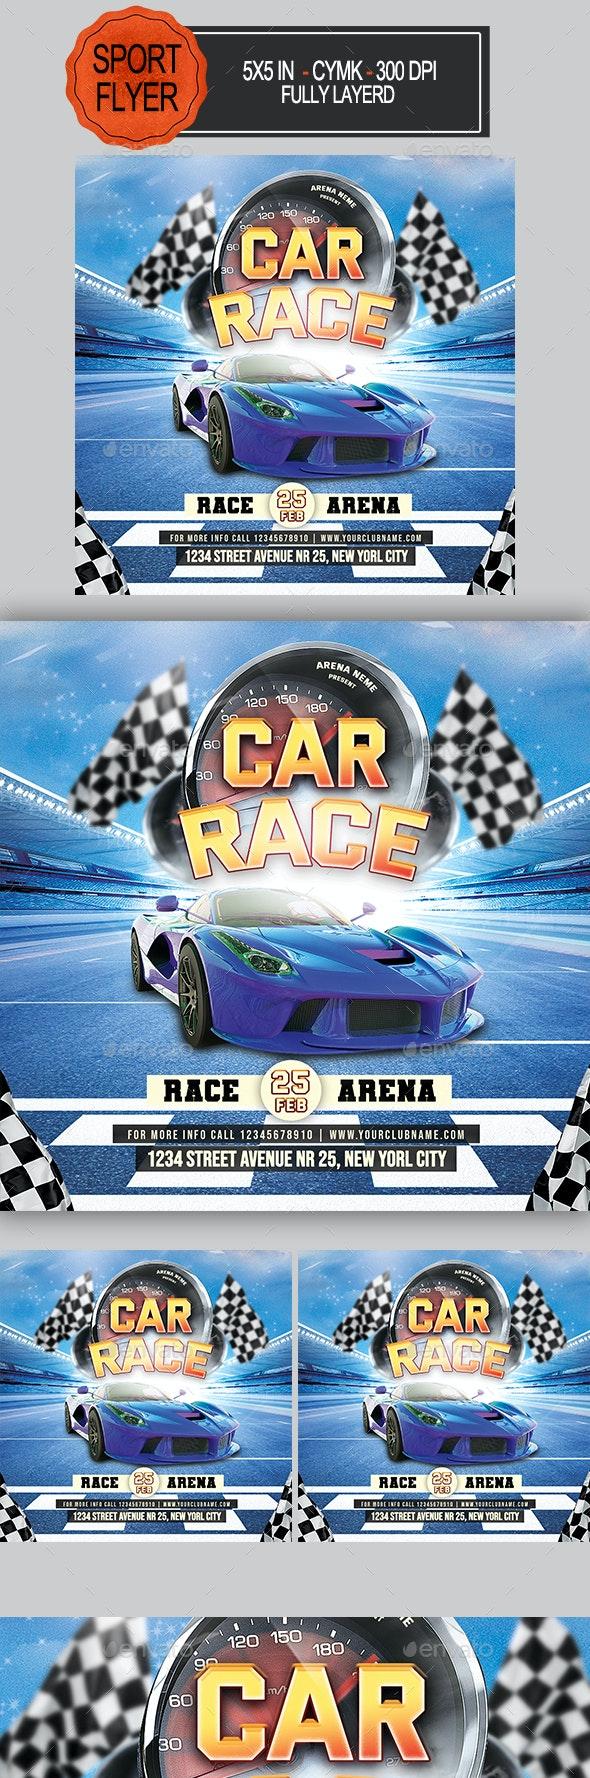 Car Race Flyer - Sports Events